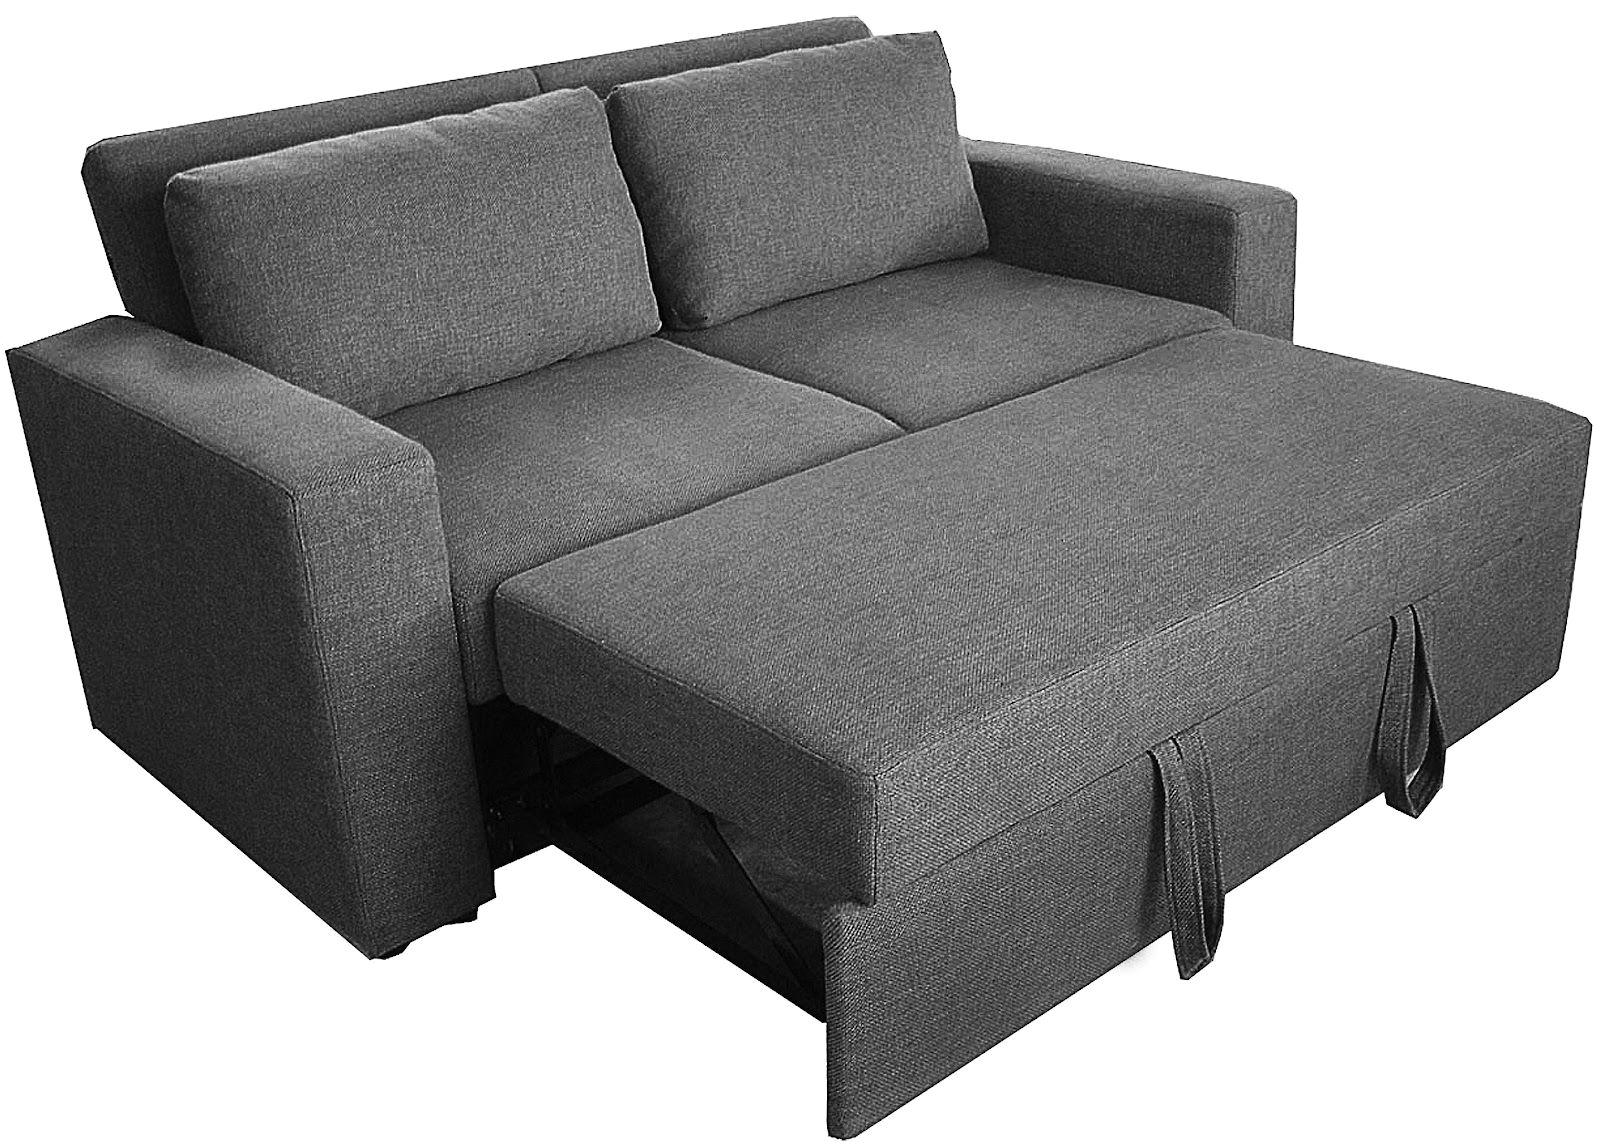 Corner Sofa Bed With Storage Bed Storage Small Sleeper Sofa Small Sofa